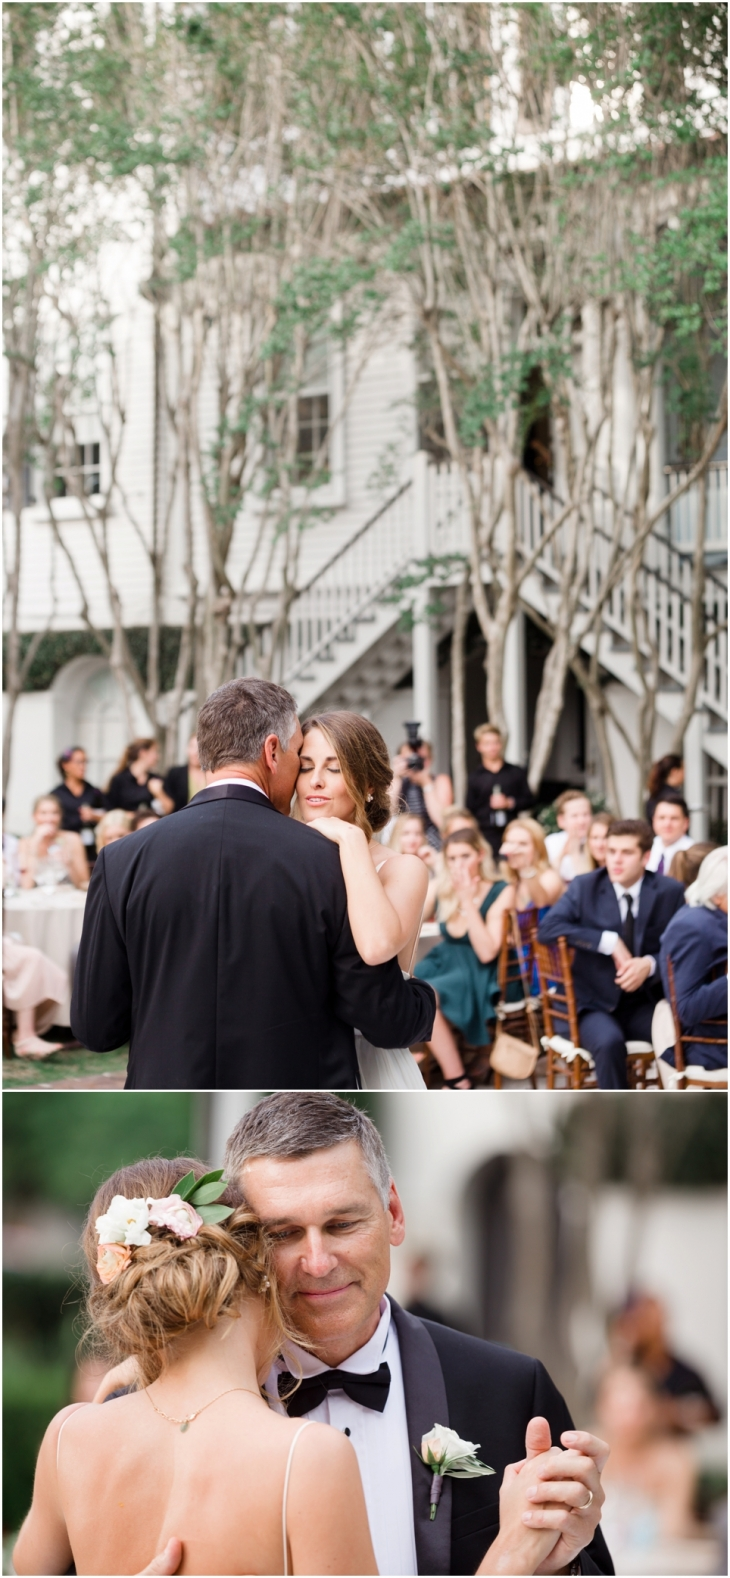 Thomas bennett house Wedding Photos